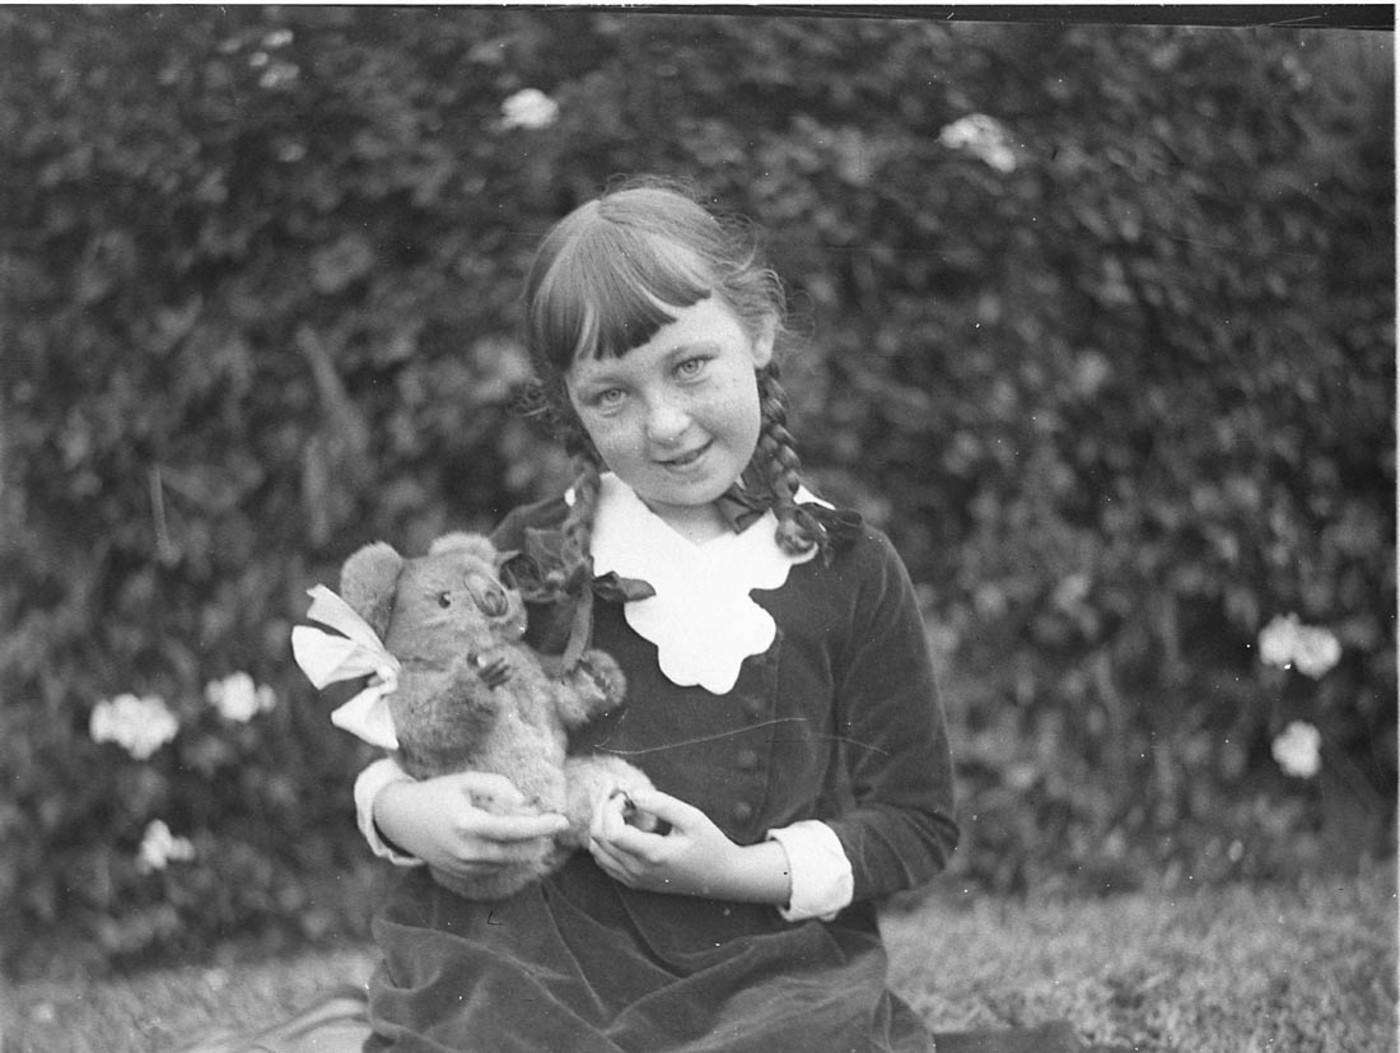 Mr Thatcher's little daughter holding toy koala, c. 1934 / by Sam Hood